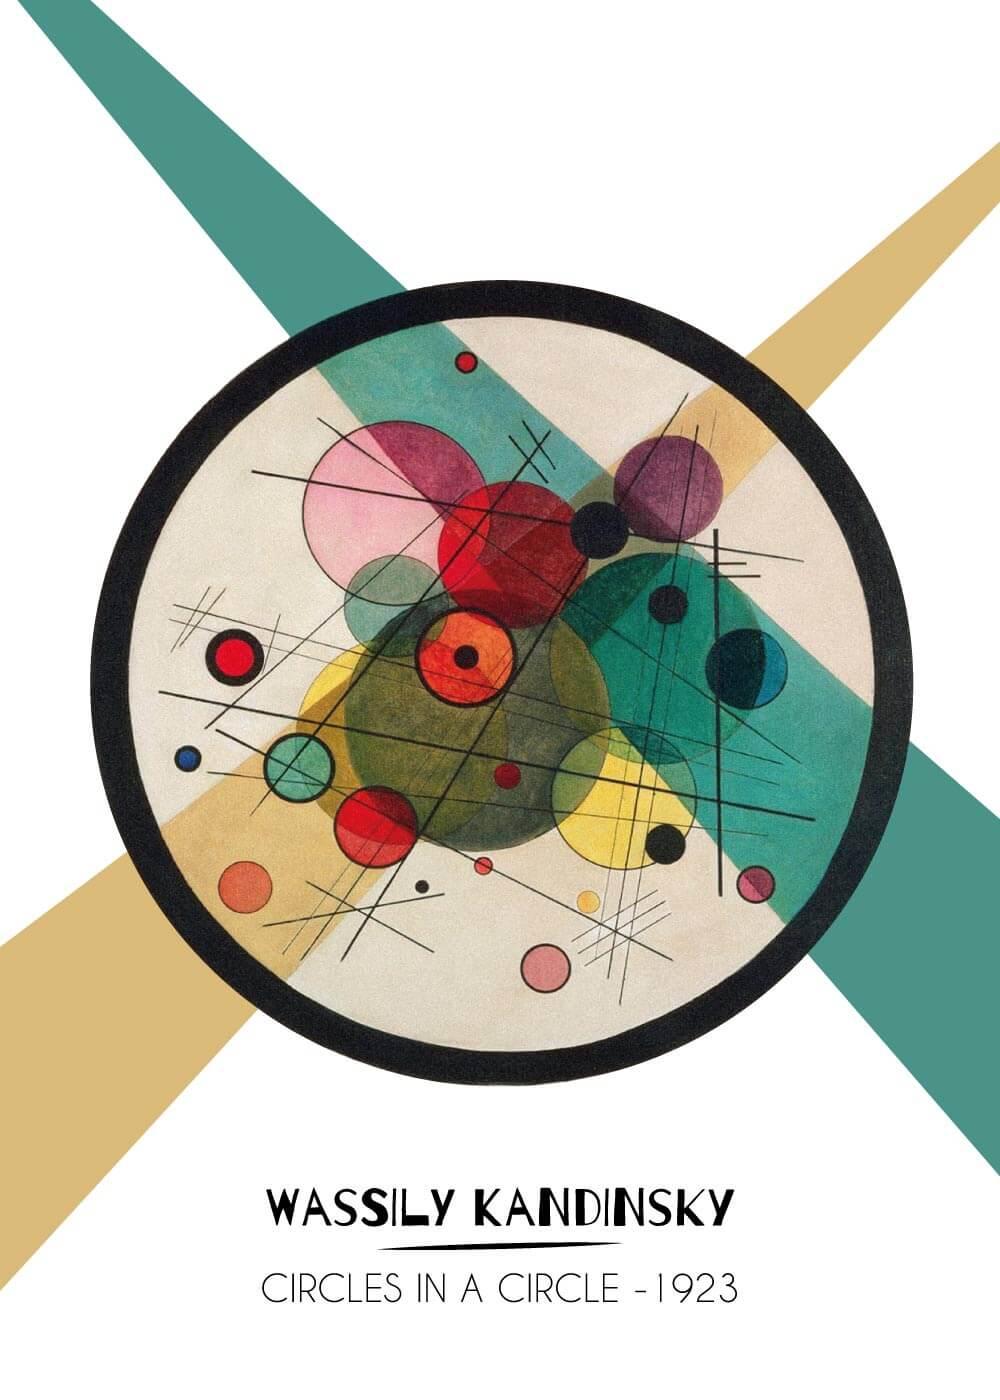 Billede af Circles in a circle - Wassily Kandinsky